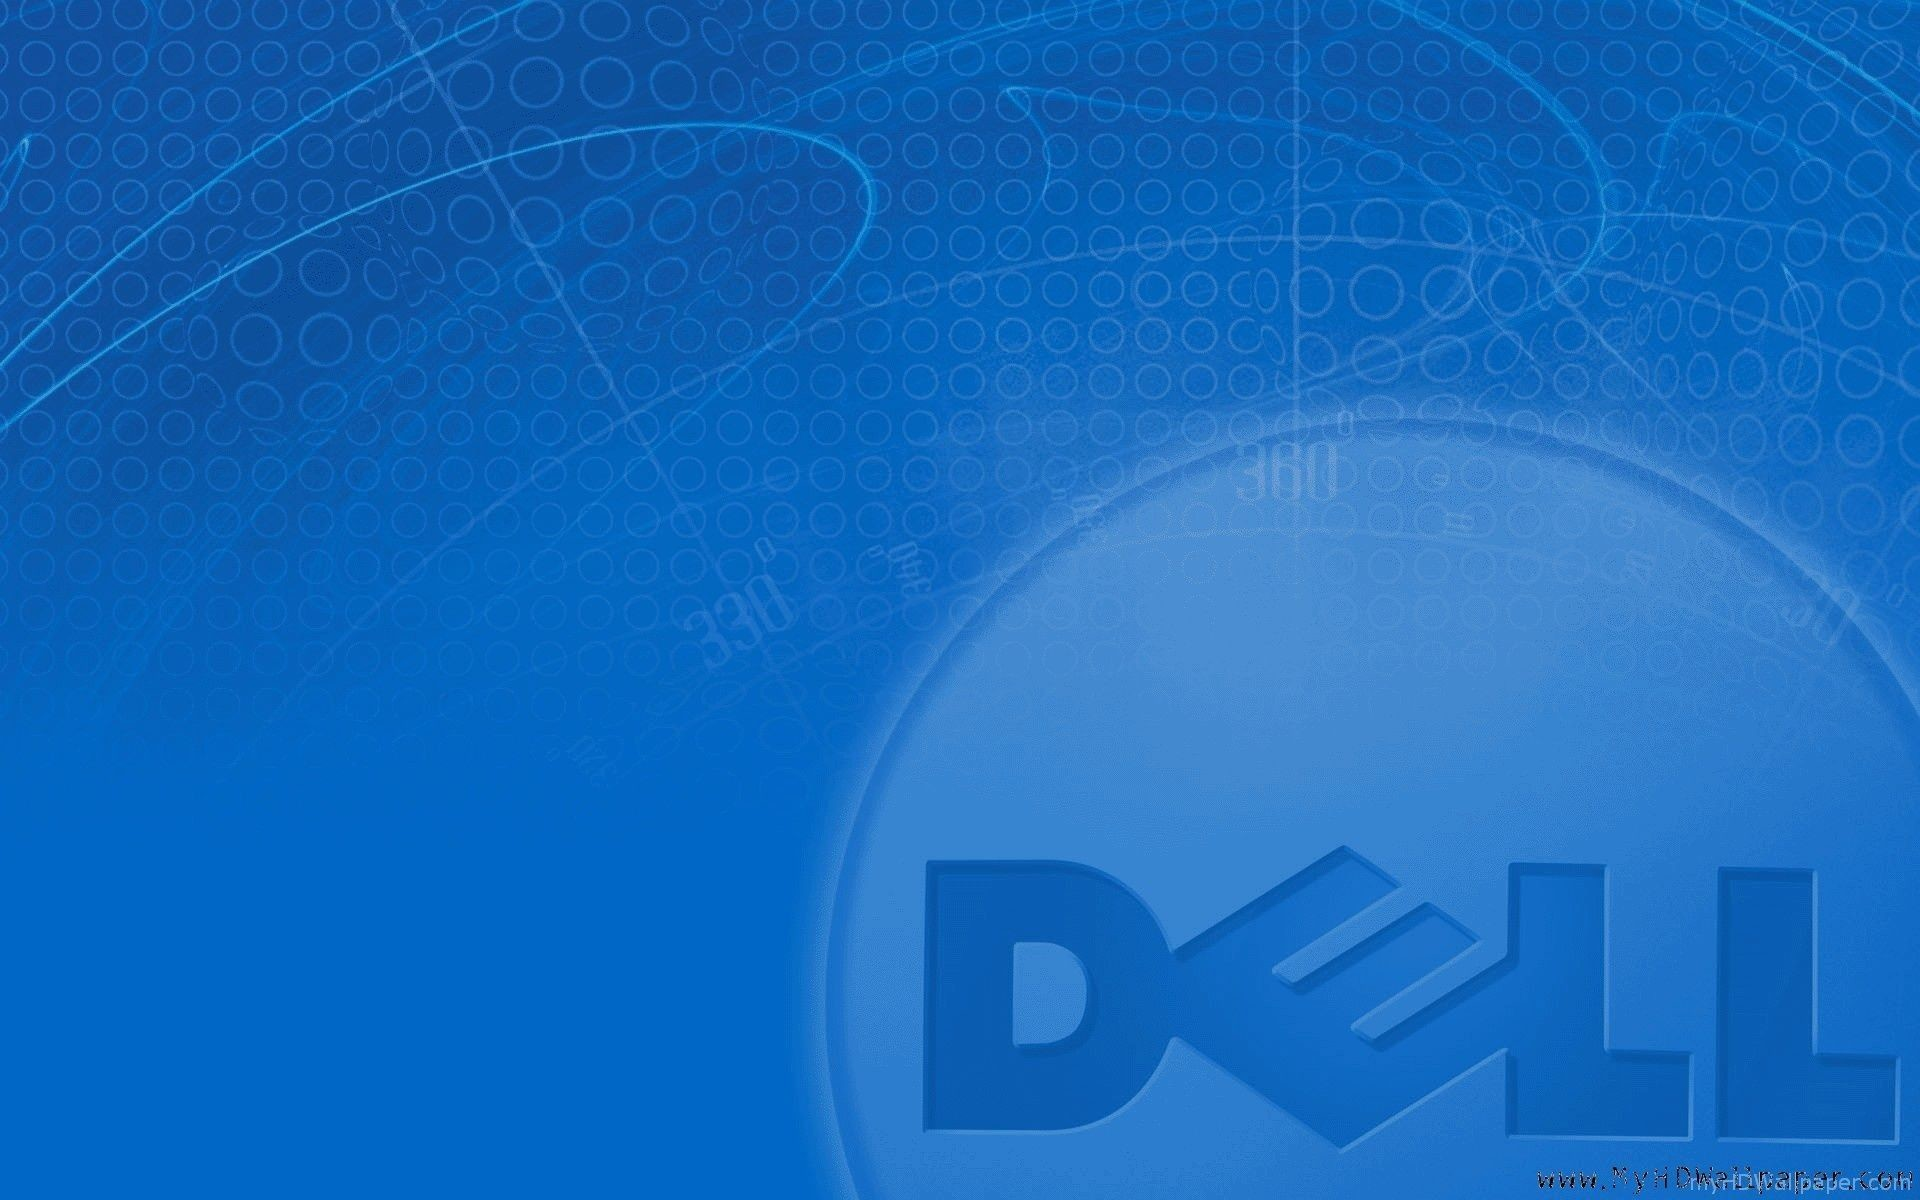 Dell Xps Wallpaper 1920x1080 (74+ images)